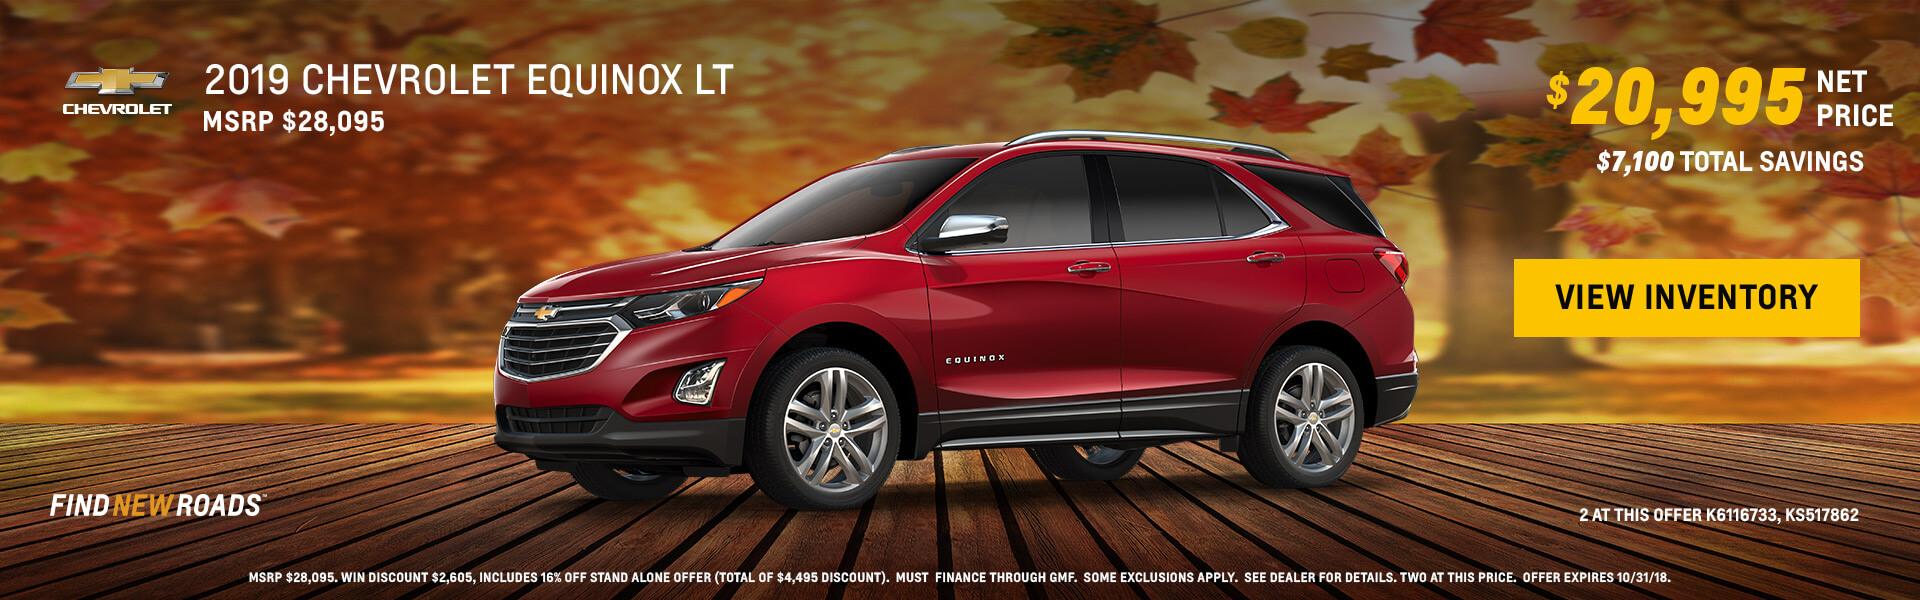 New & Used Chevrolet Dealer | Long Beach, Torrance & Los Angeles | Win Chevrolet